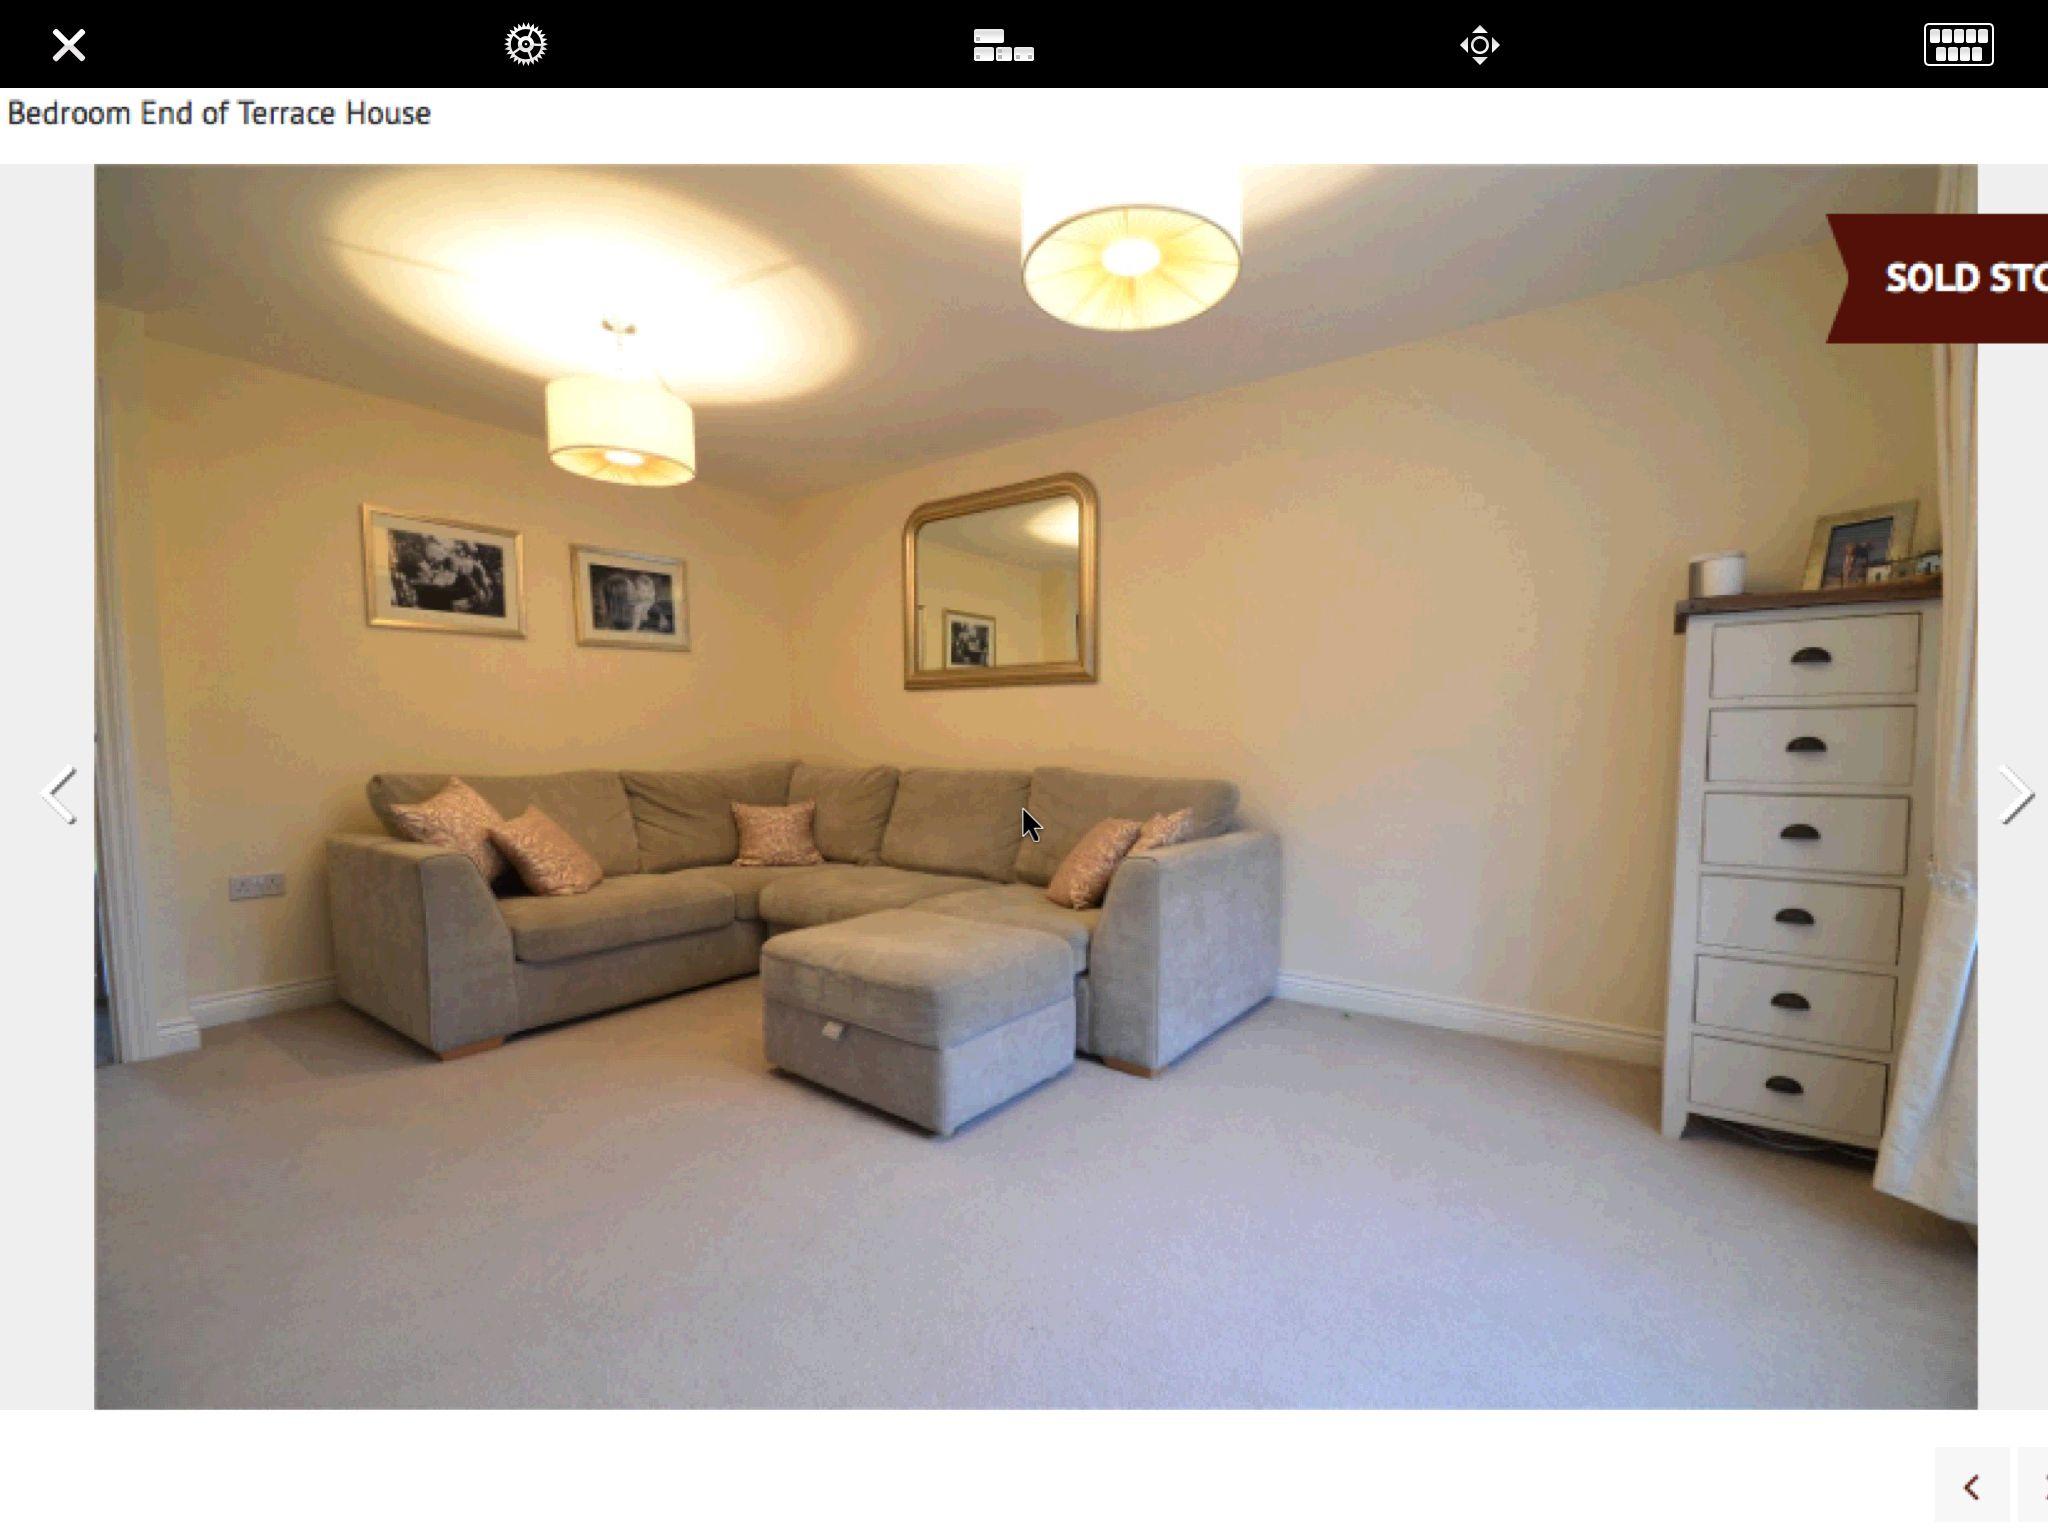 Living room   David wilson homes, Home, Home decor